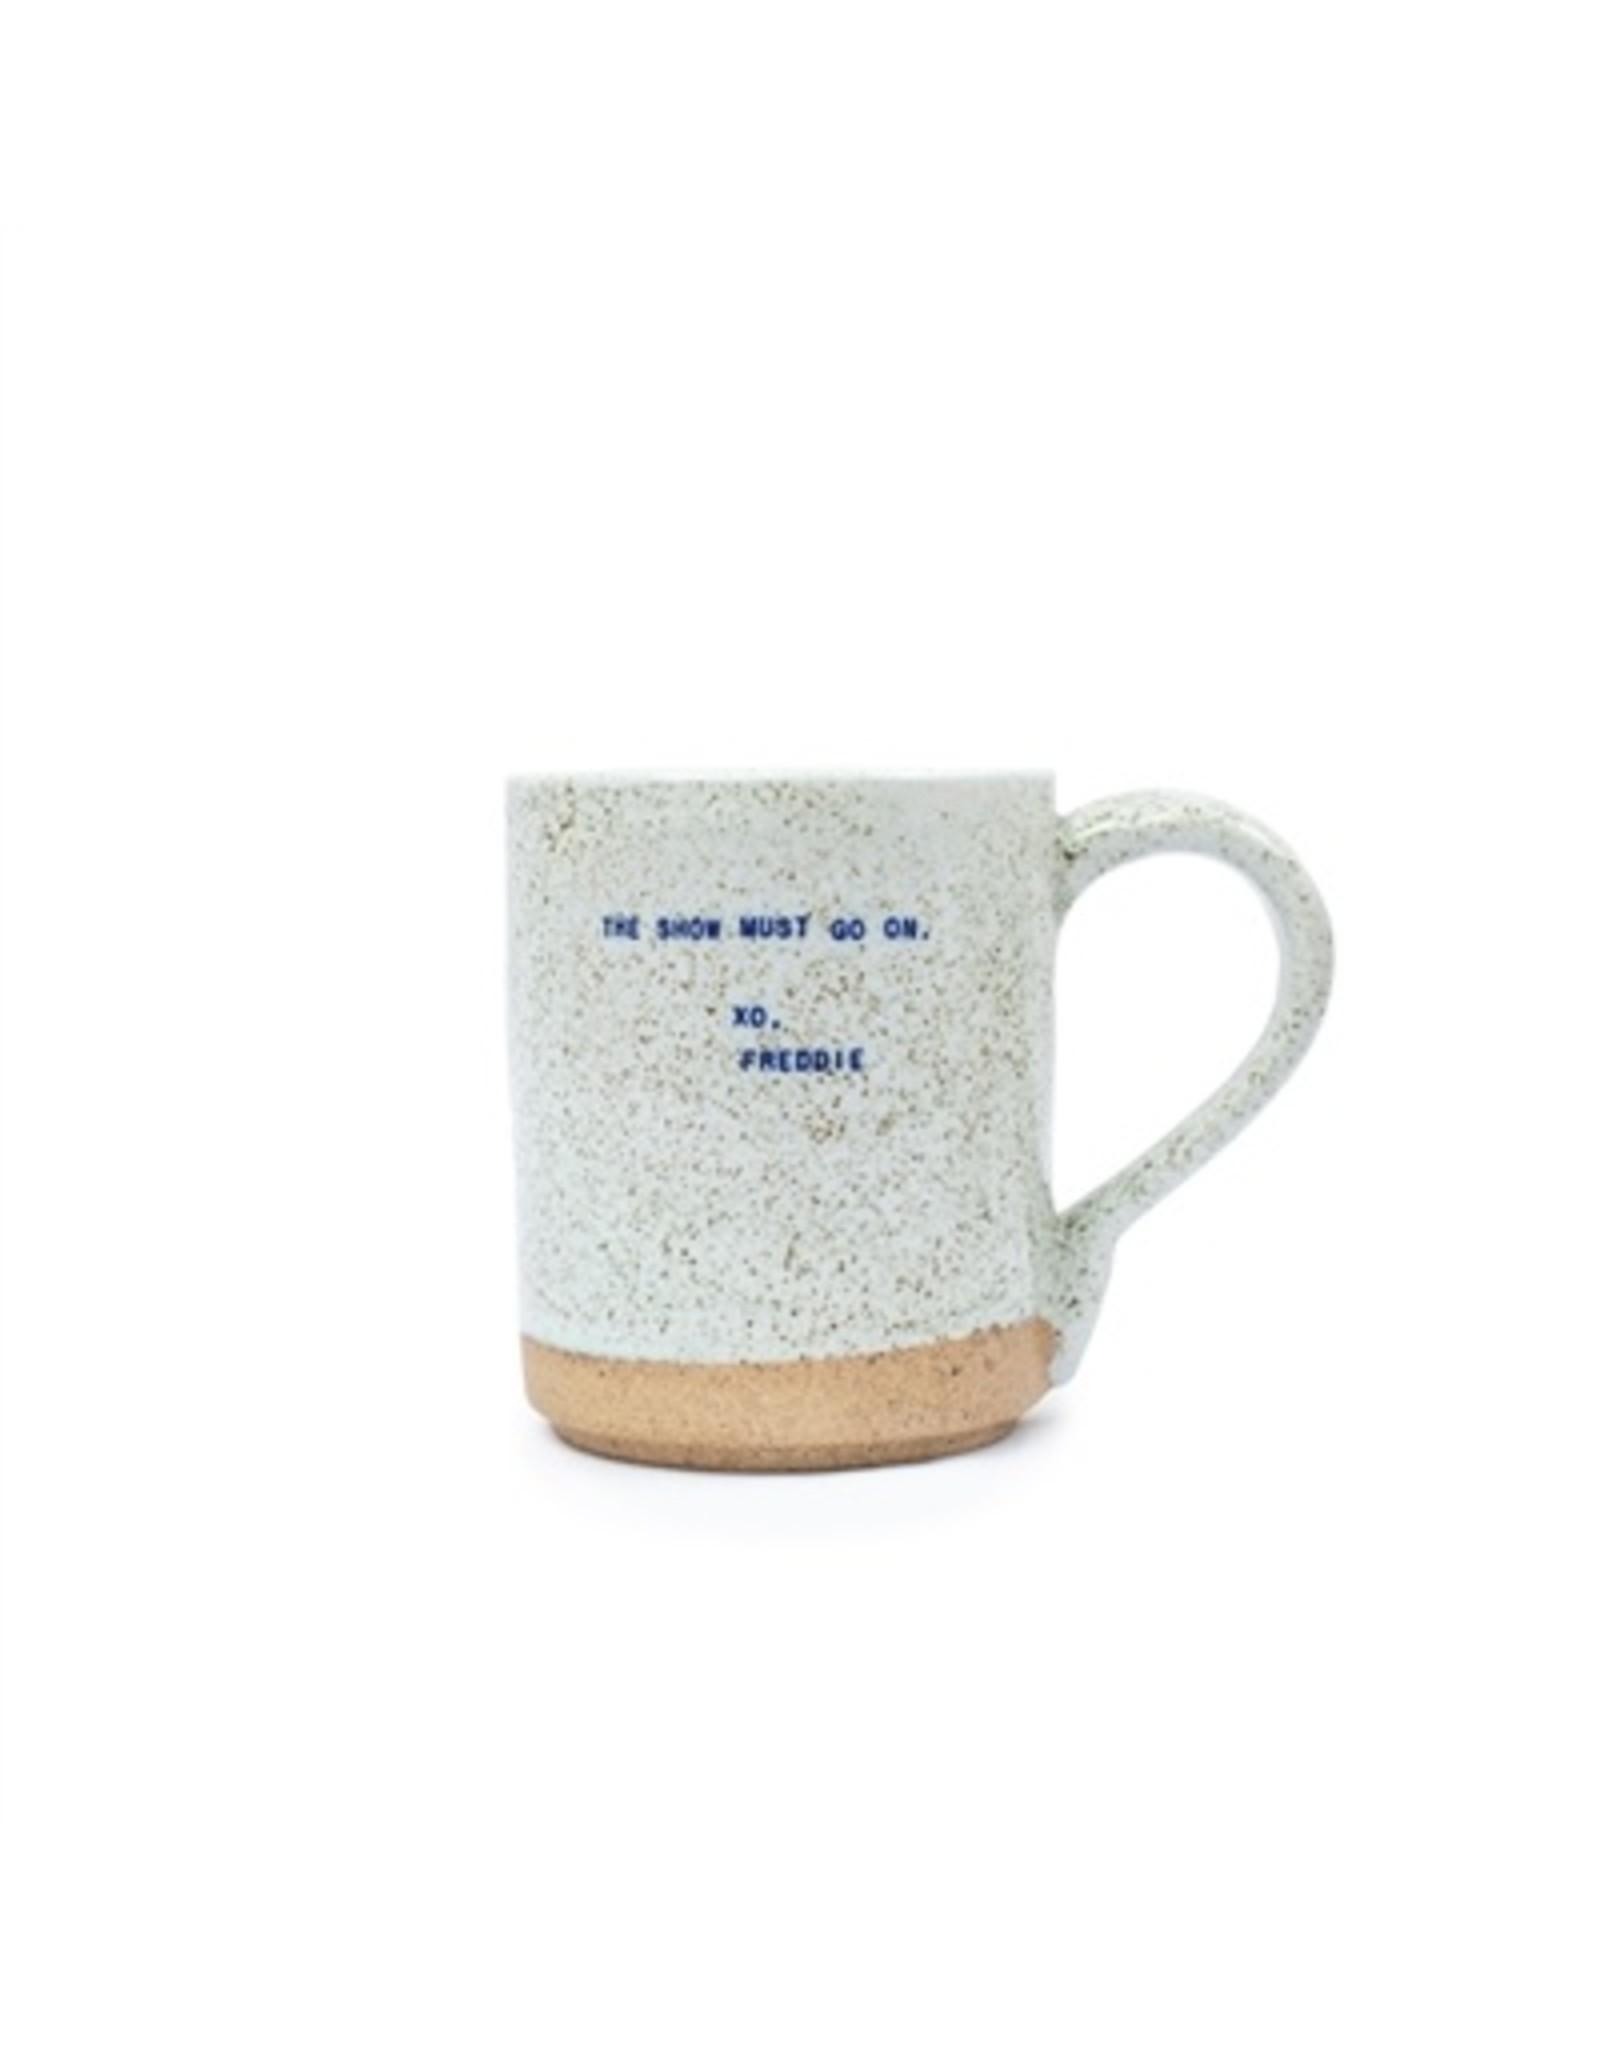 Sugarboo & Co XO Mugs - 2nd Edition - Singers